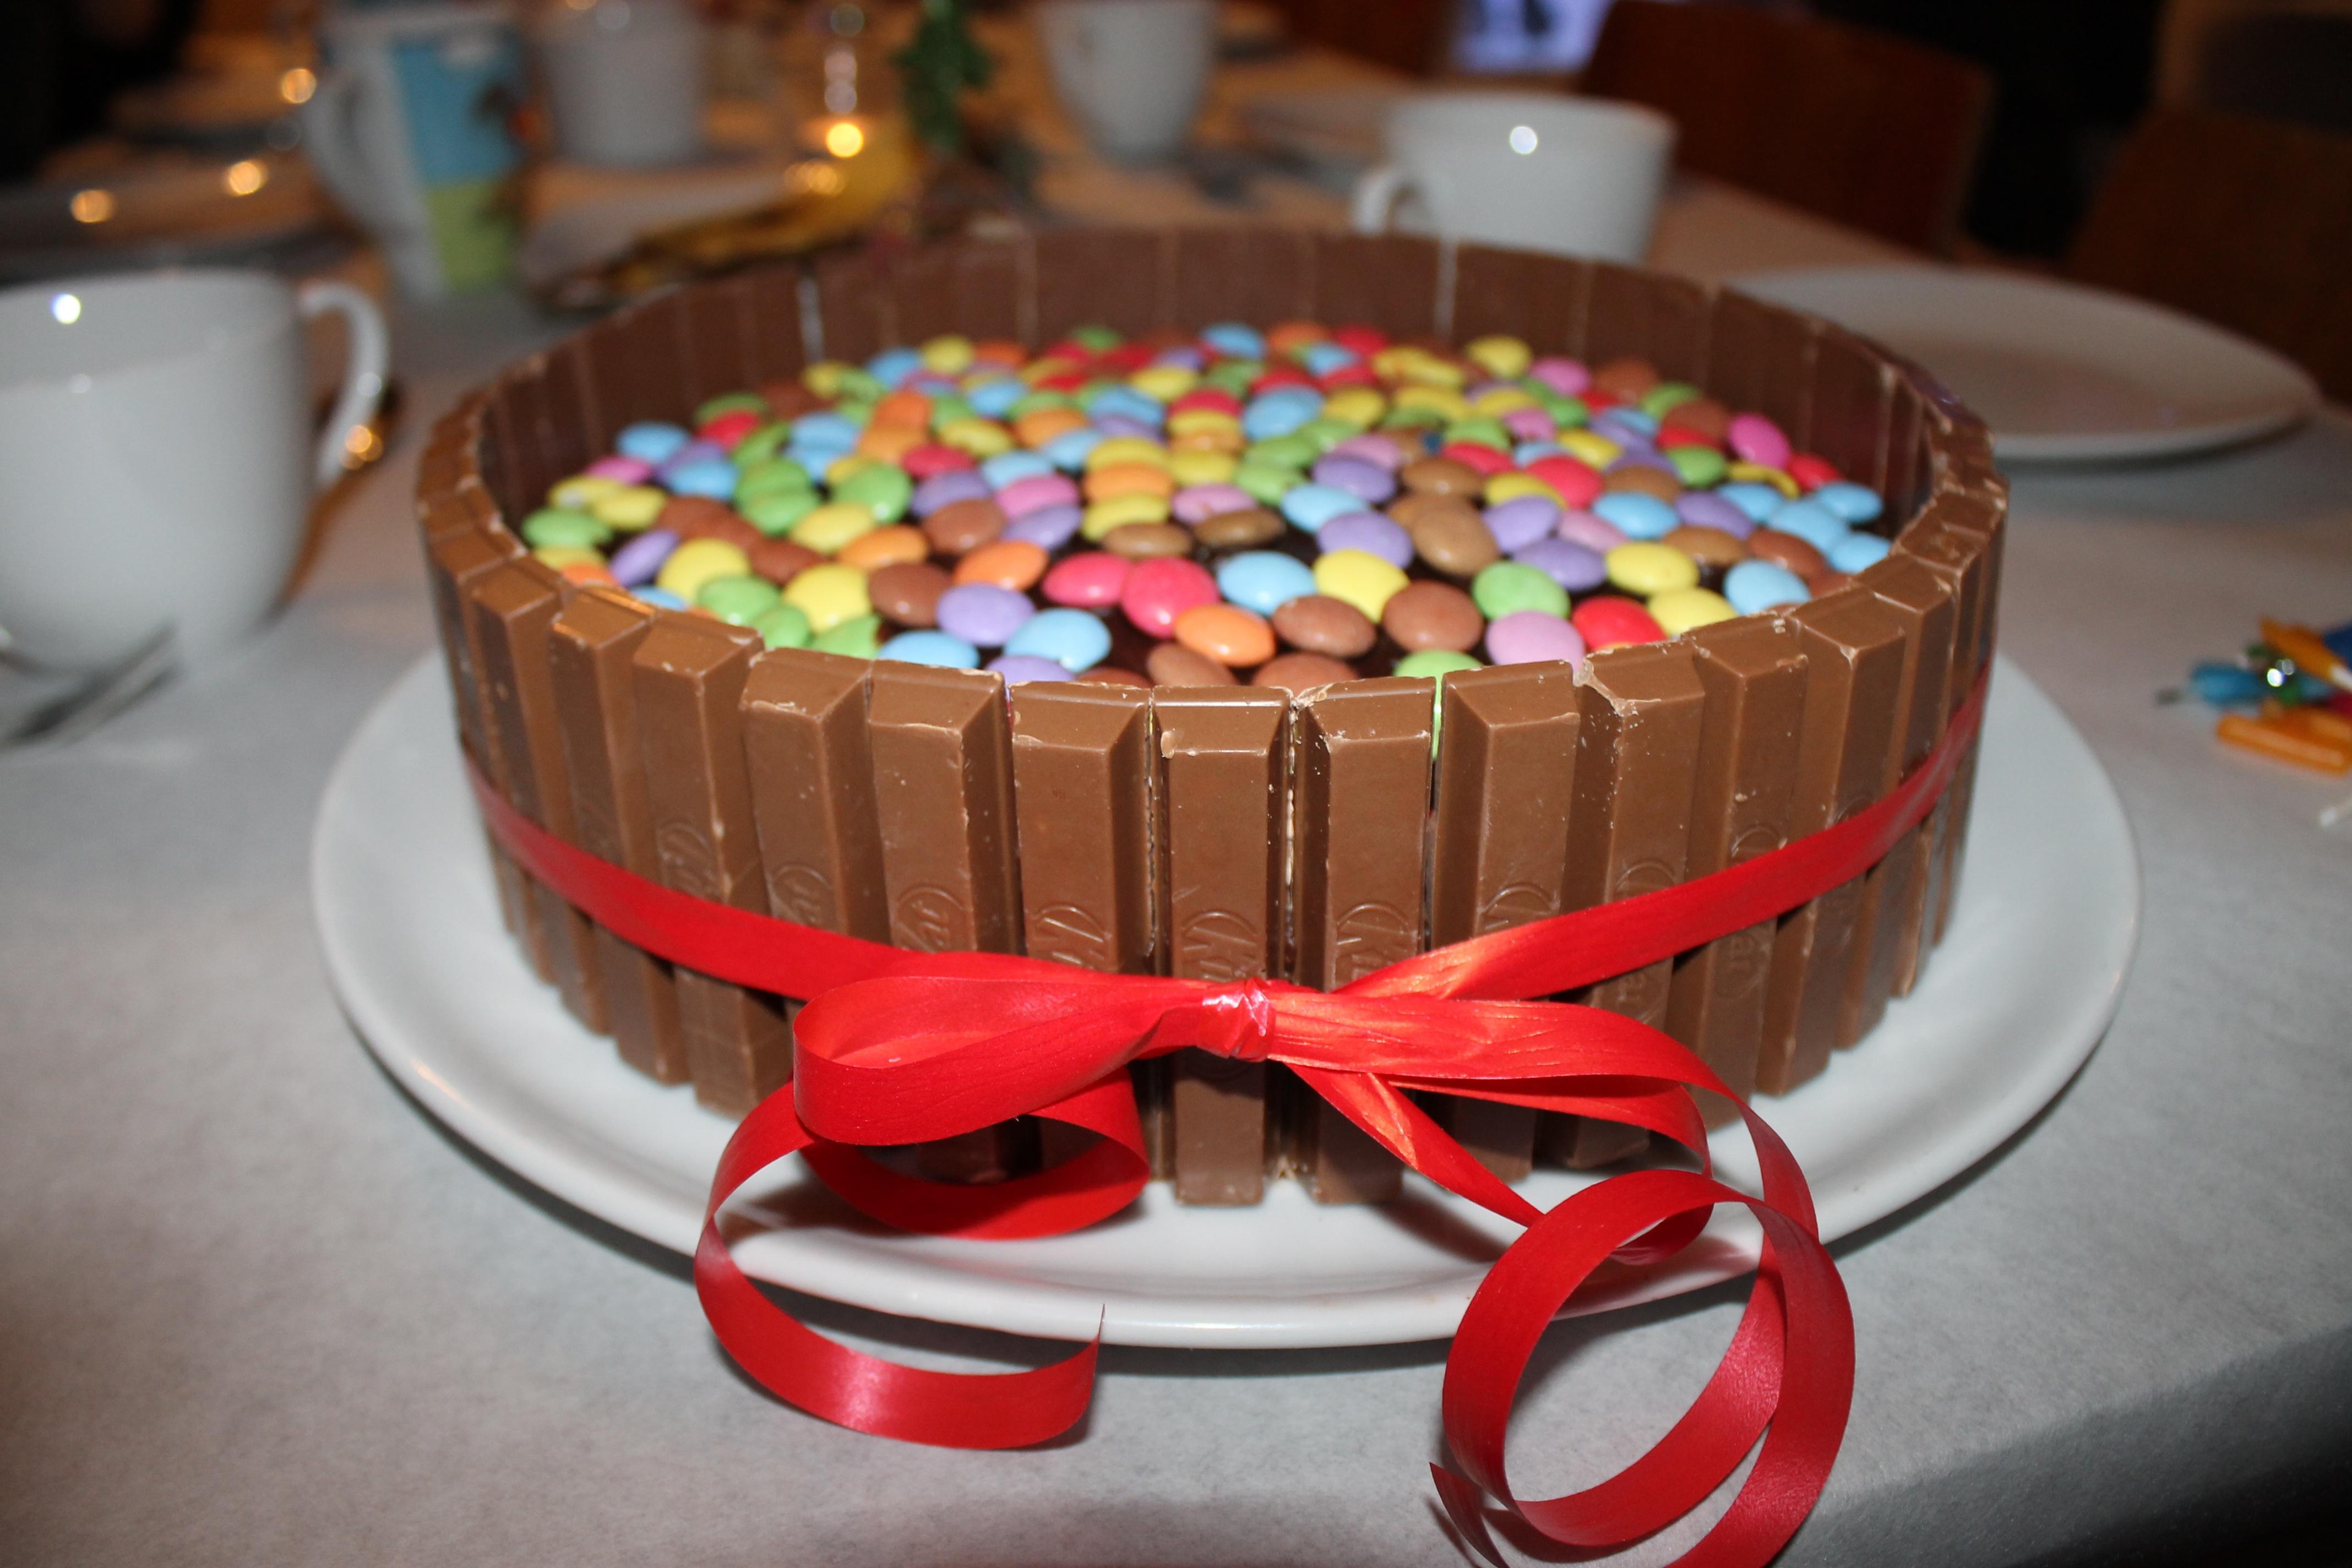 comida postre comer pastel pastel de cumpleaos formacin de hielo fiesta cumpleaos dulzura productos horneados sabor